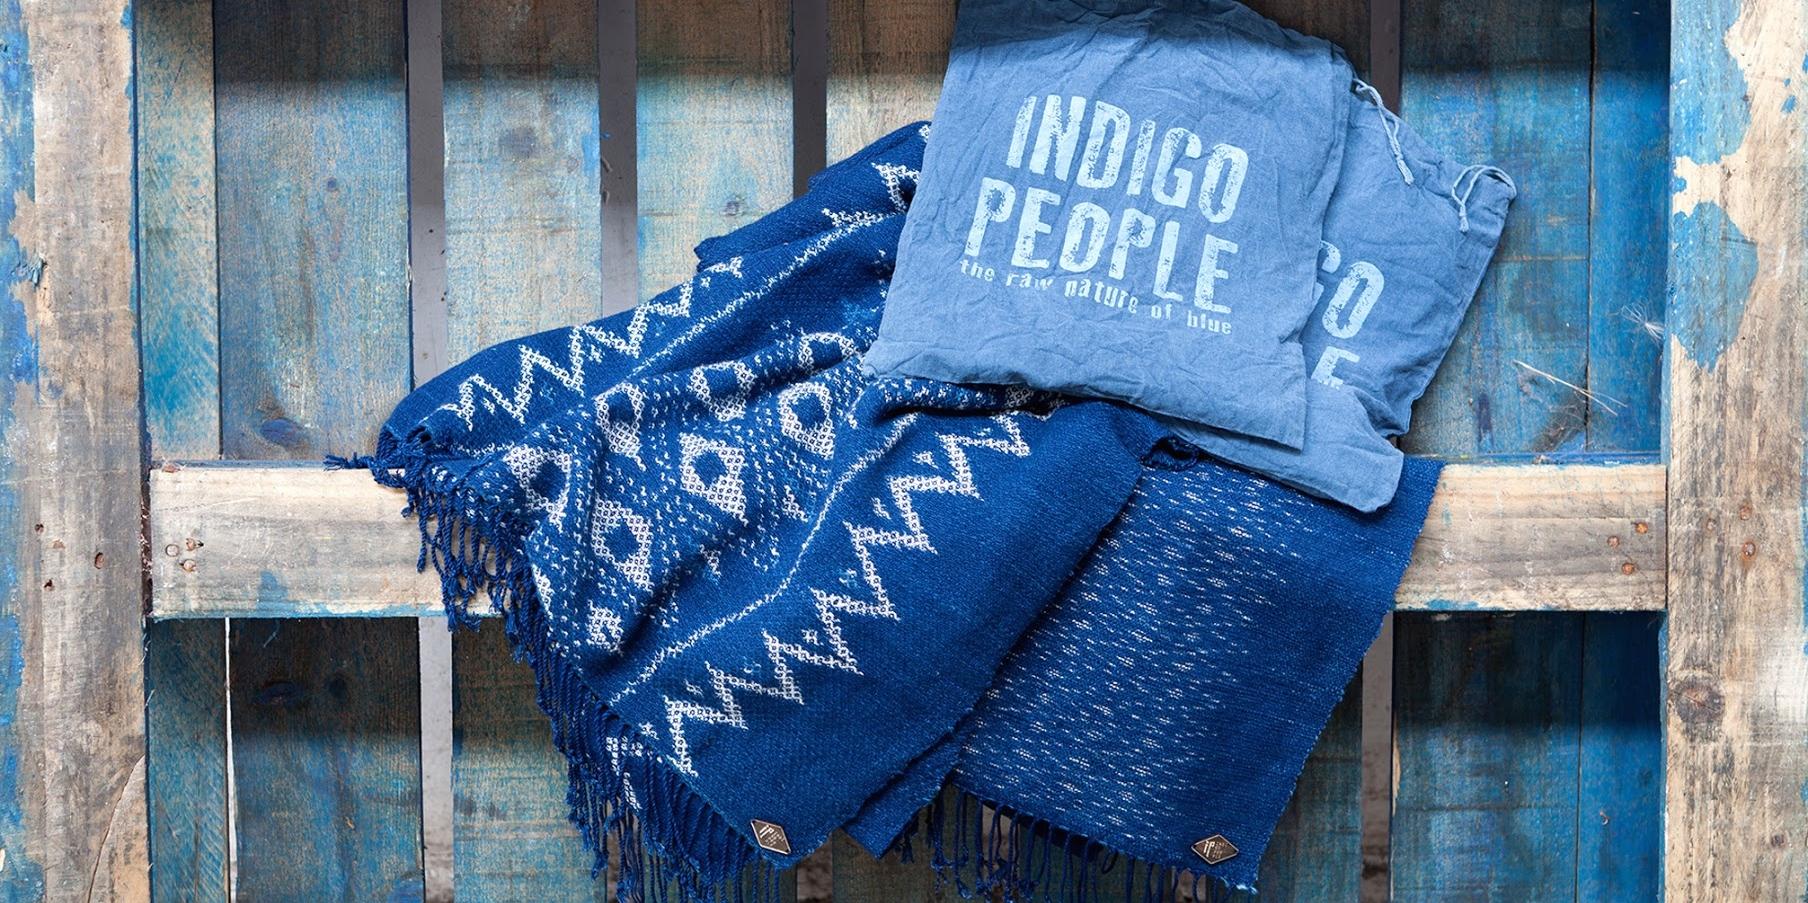 indigo-people-woven-accessories-fall-winter-2014-00